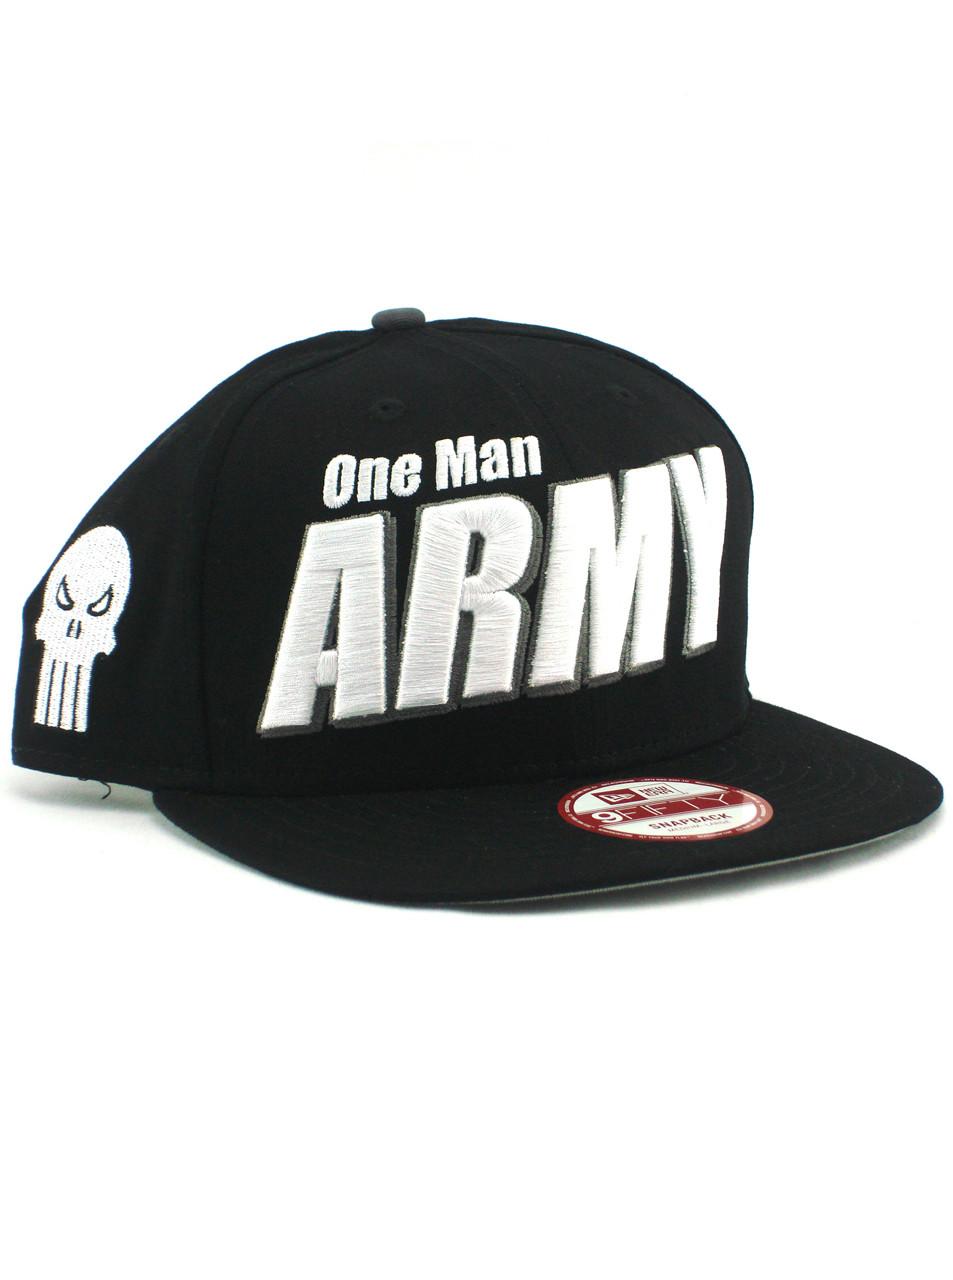 New era punisher one man army fifty snapback hat boondock jpg 953x1280 New  era punisher hat 452d0d9009ab